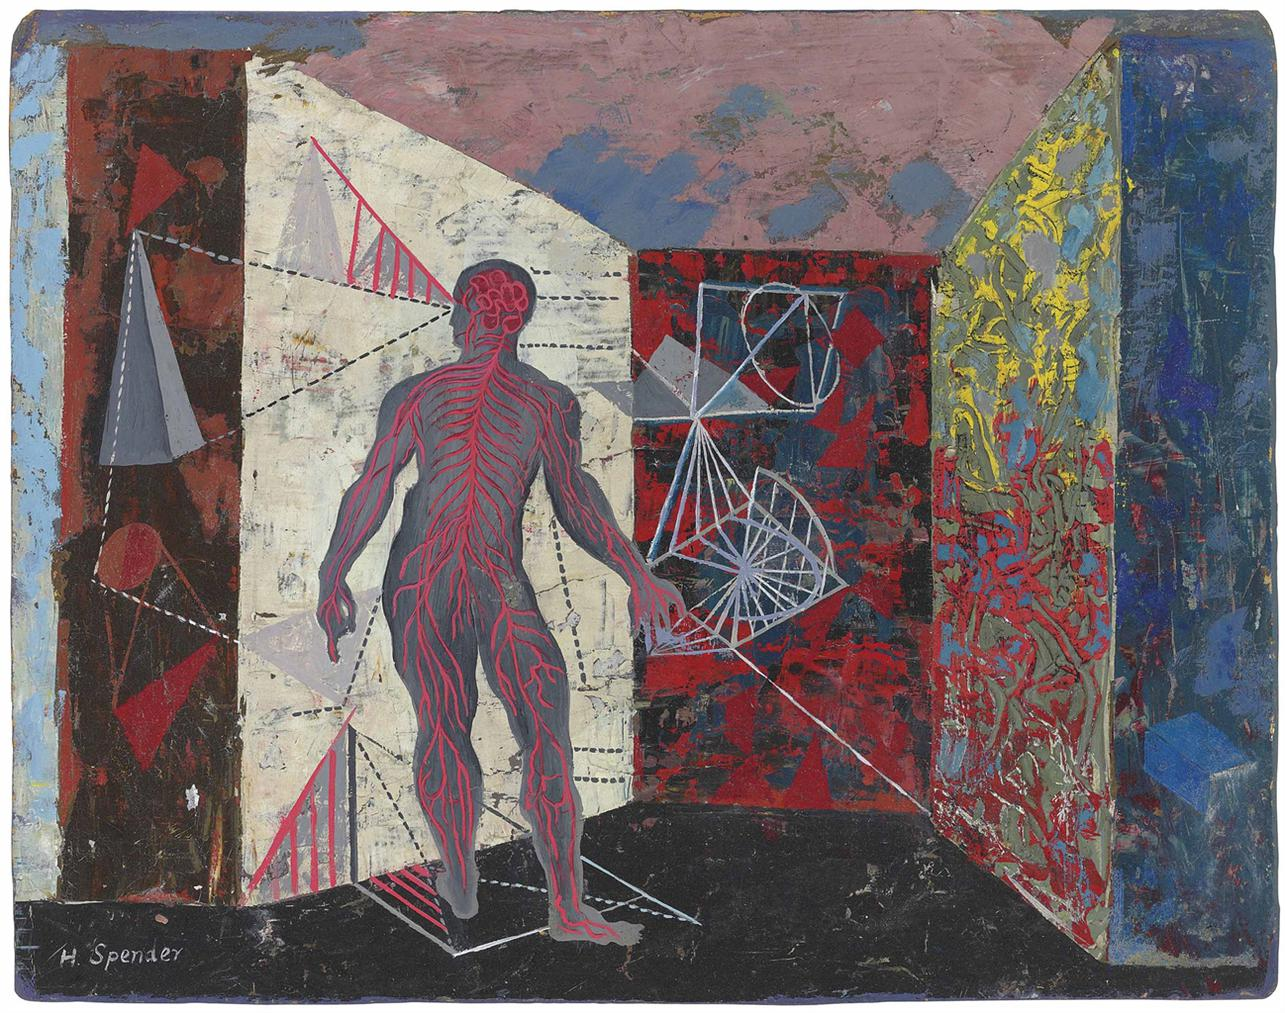 Humphrey Spender-Arterial Man-1940